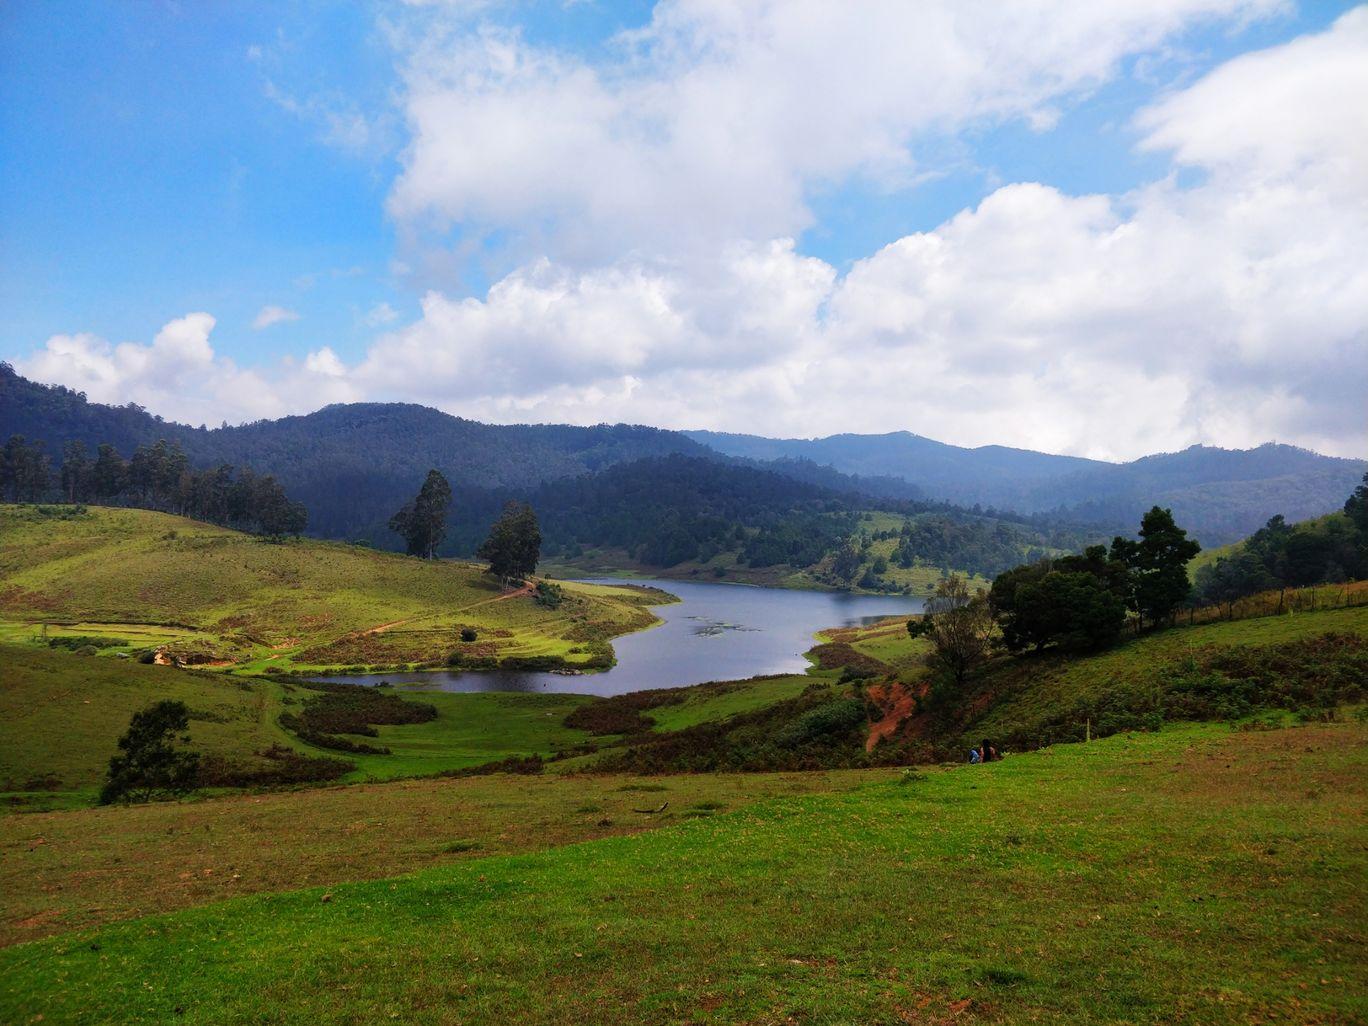 Photo of Mannavanur Lake By Mounica Paravasthu